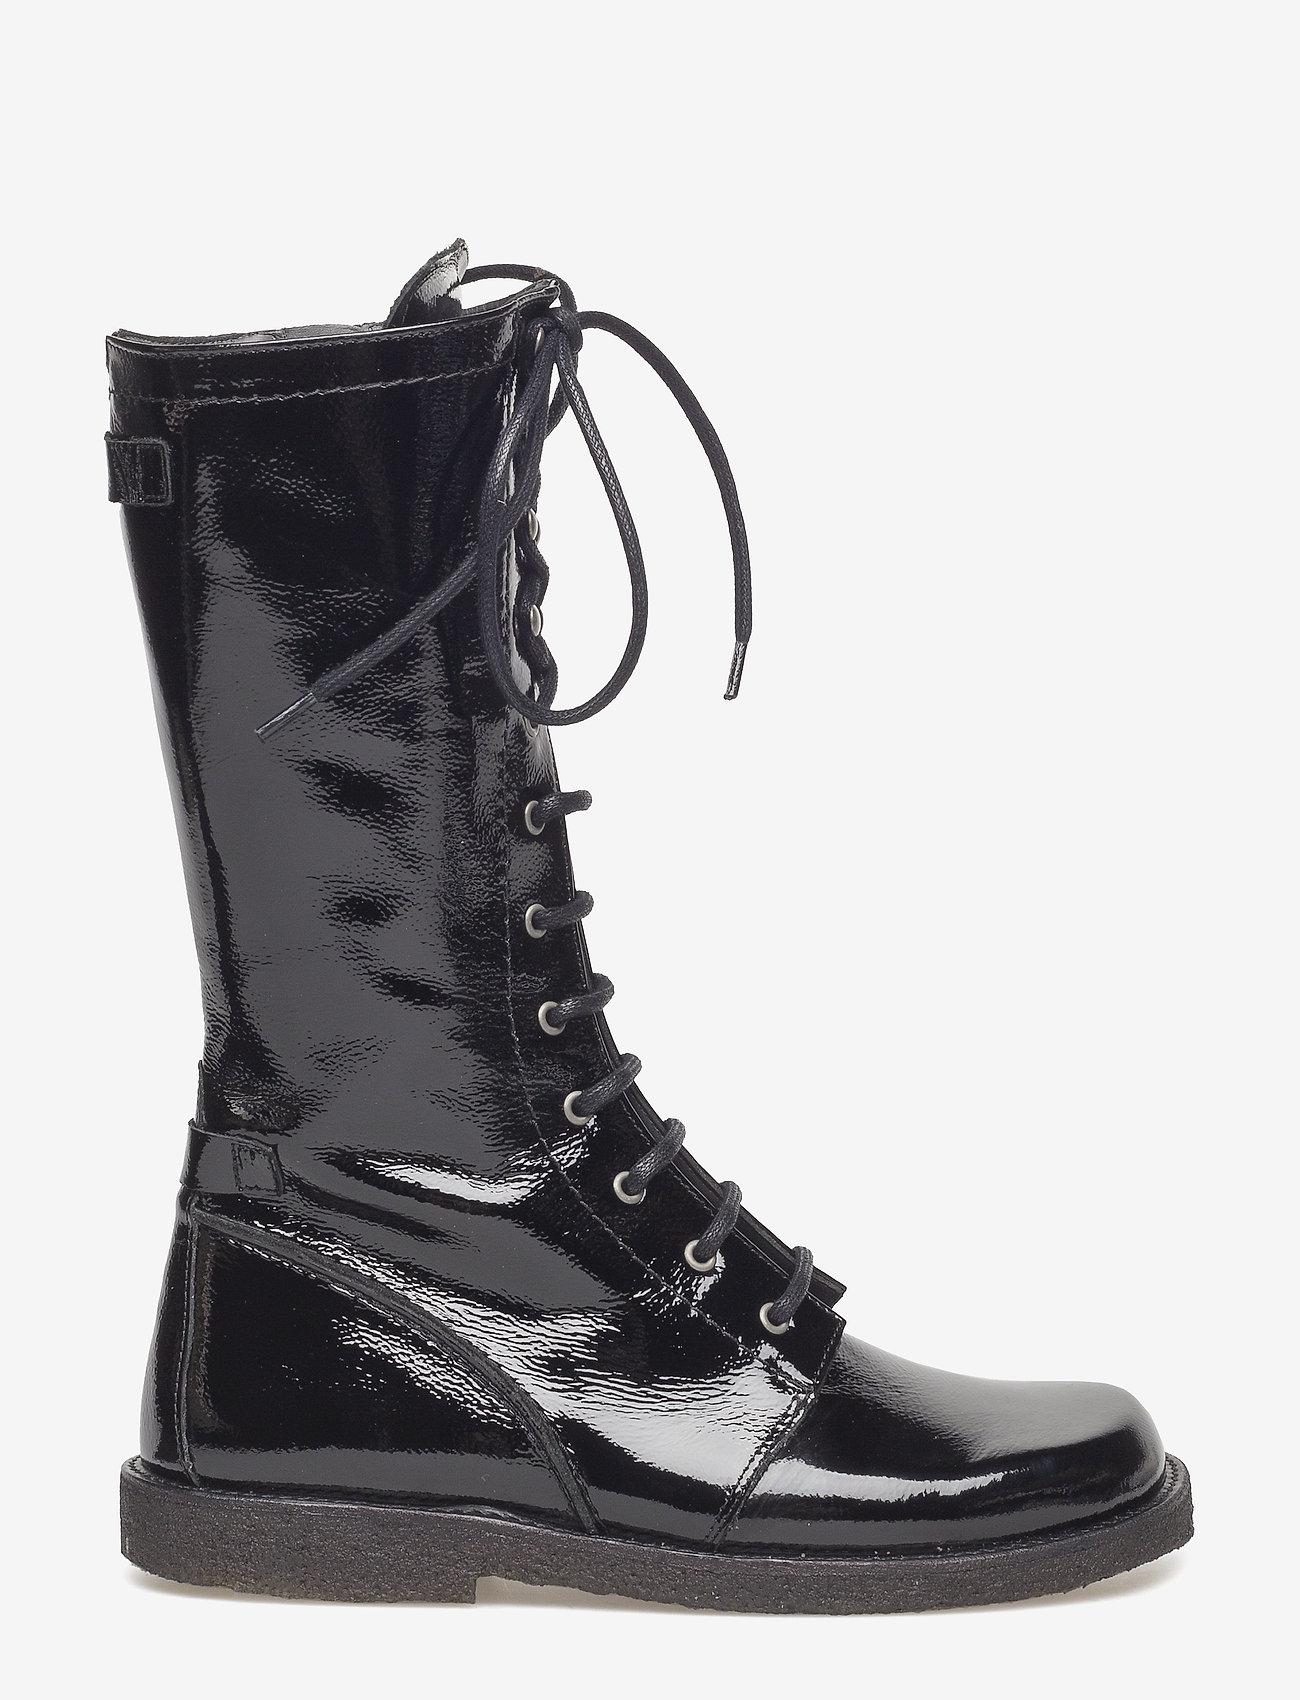 ANGULUS - Long boot with laces. - lange laarzen - 1310 black - 1